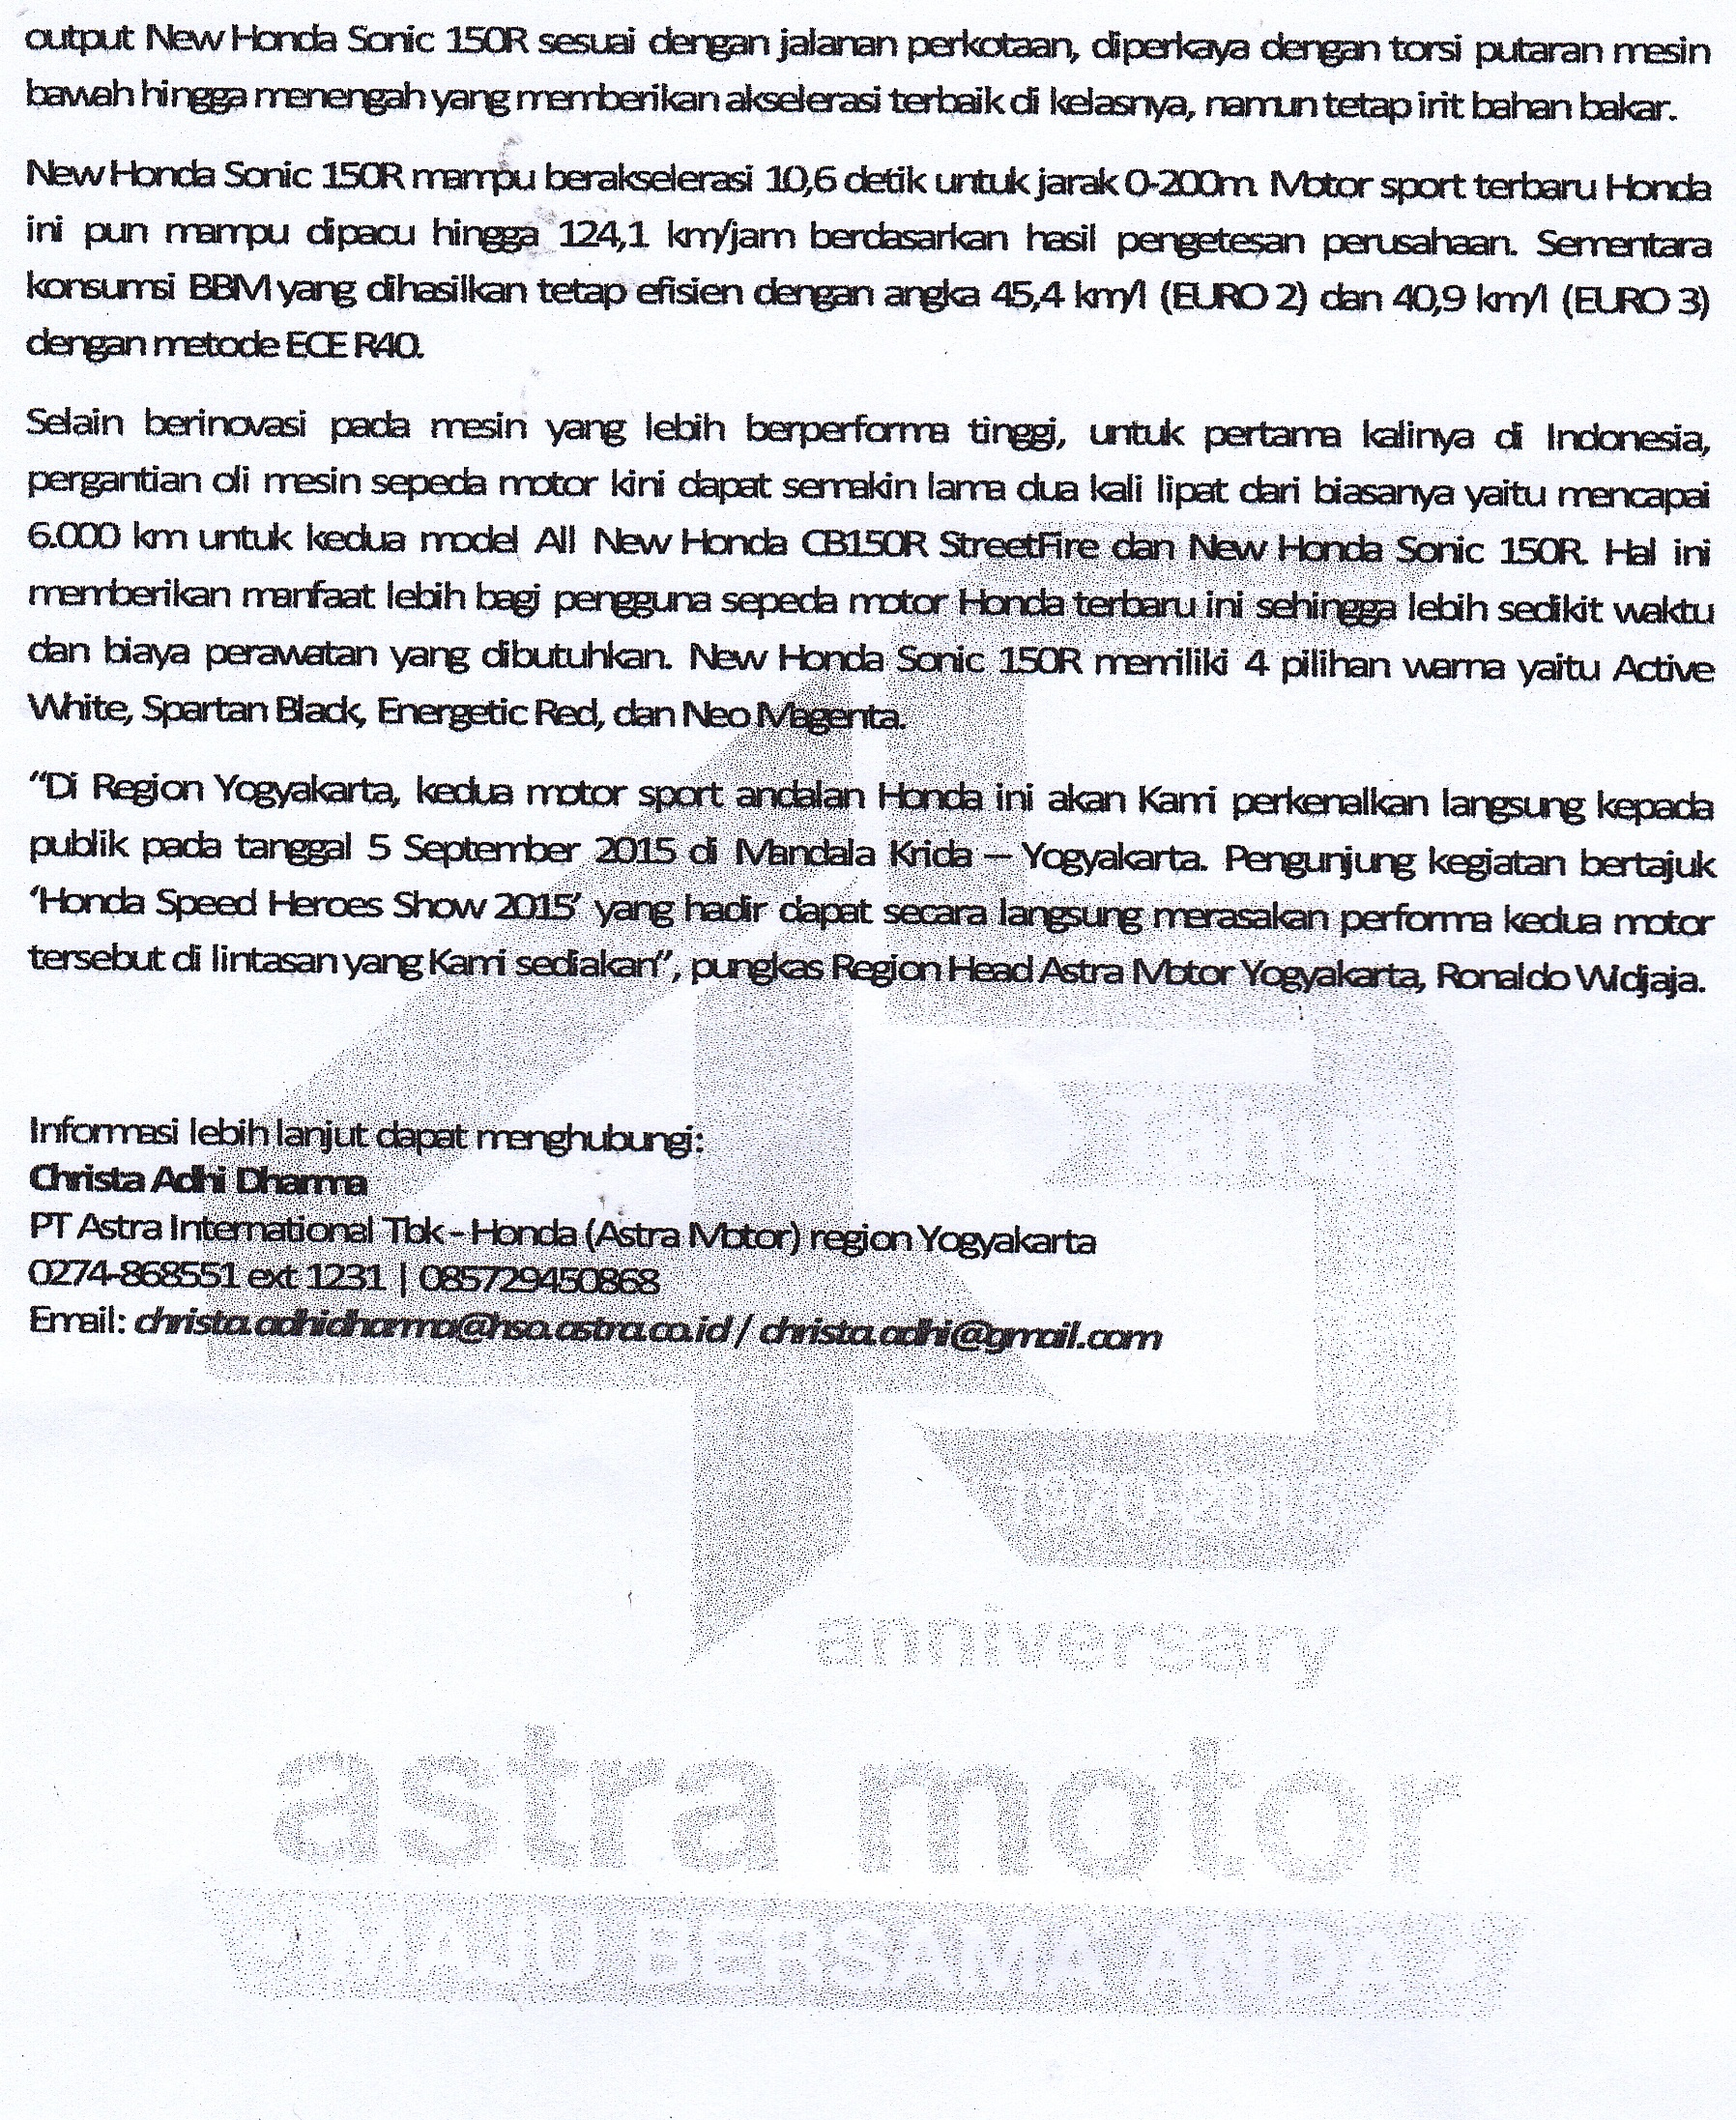 Sepeda Motor Page 113 New Vario 110 Esp Cbs Iss Grande White Yogyakarta Pr3ok